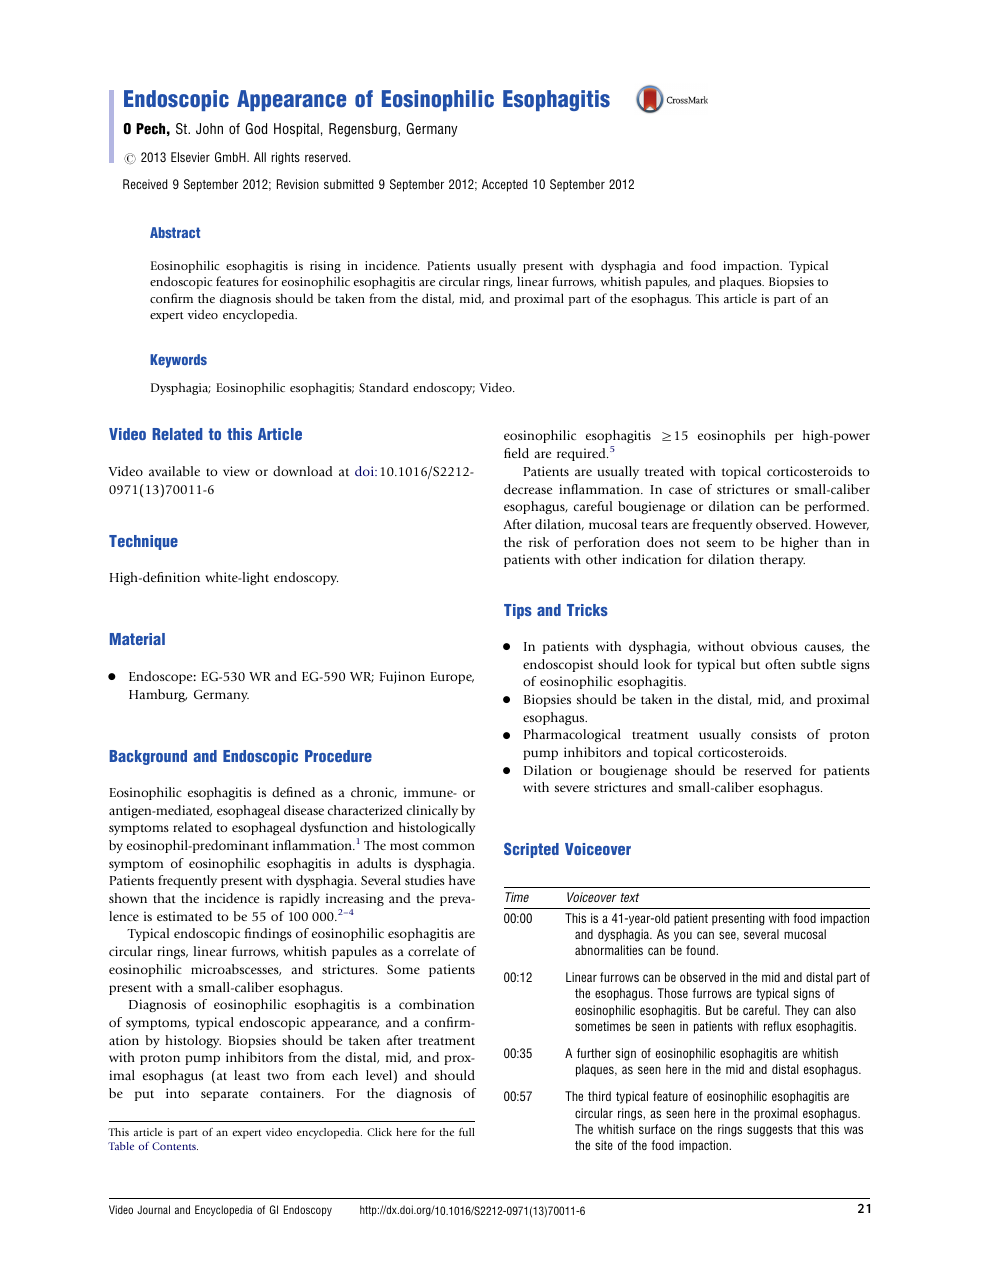 Endoscopic Appearance Of Eosinophilic Esophagitis Topic Of